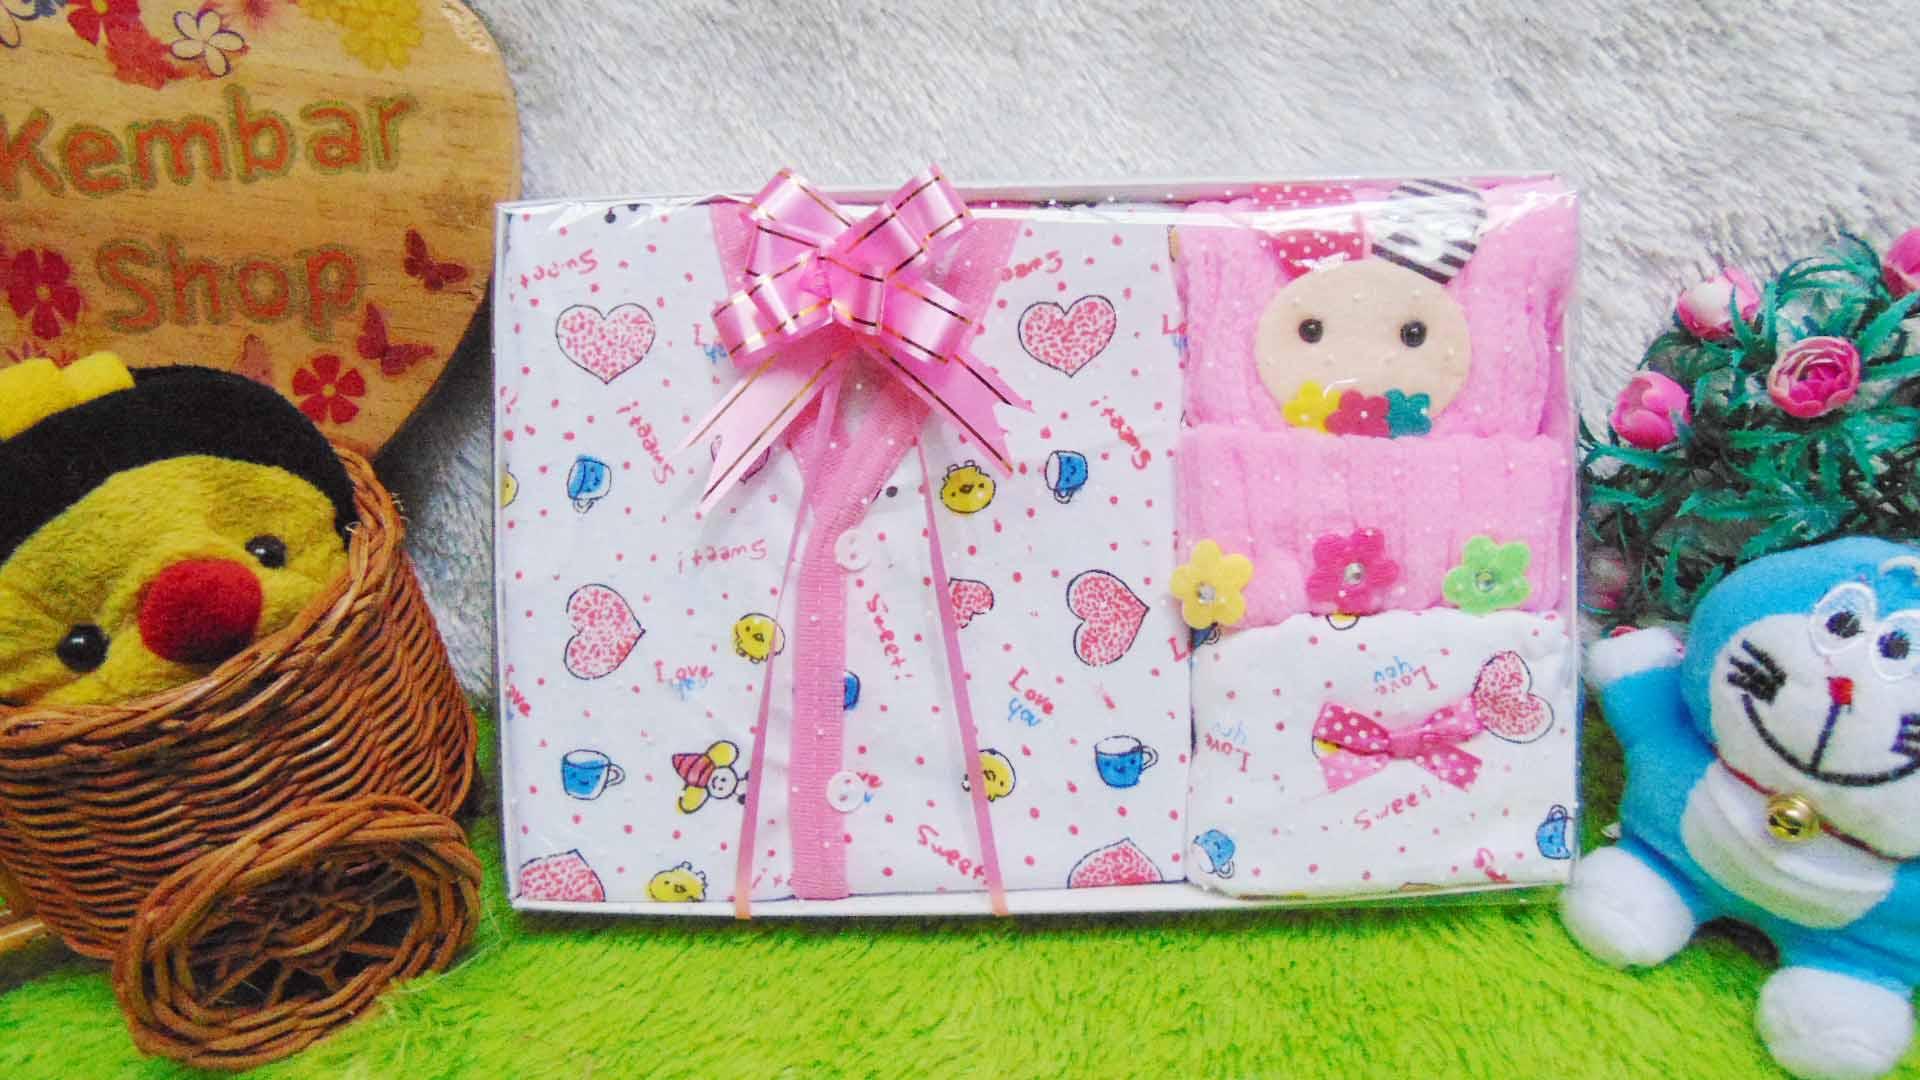 FREE KARTU UCAPAN Kado Lahiran Paket Kado Bayi Newborn Baby Gift Box Lebah Rajut Full Package Aneka Warna (10)